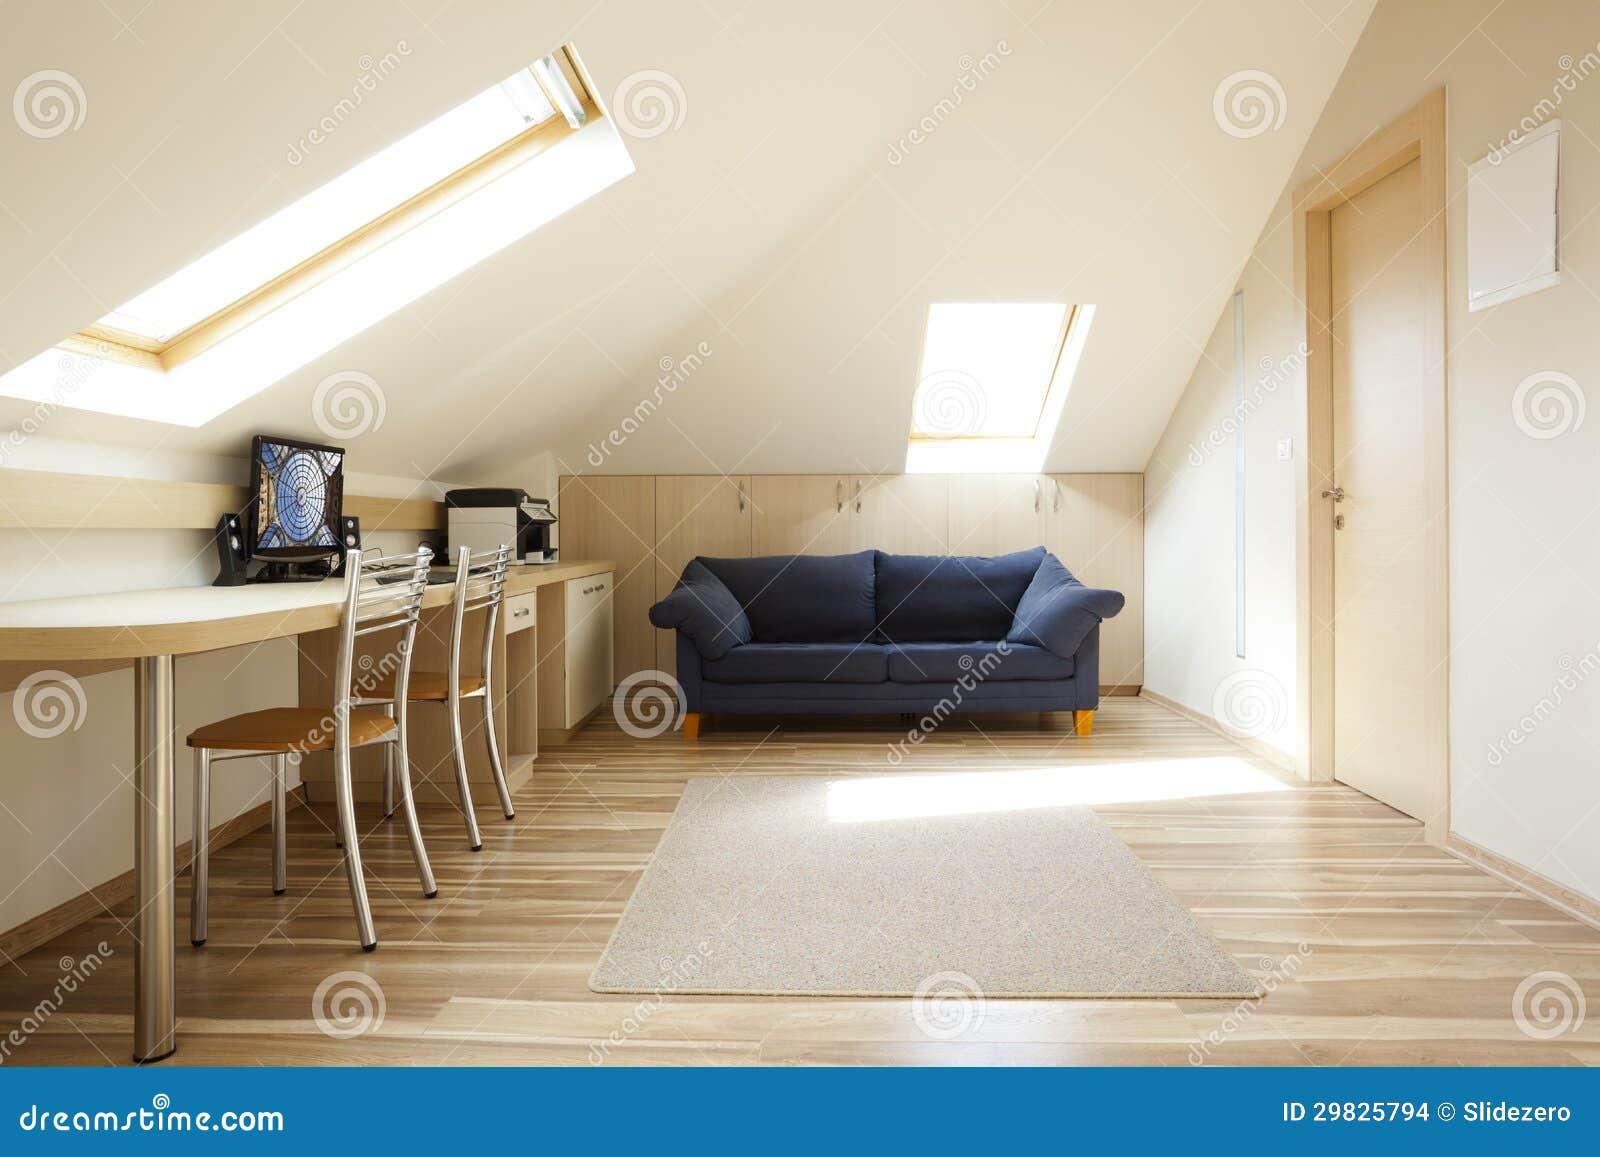 Download Sala da mansarda foto de stock. Imagem de architectural - 29825794